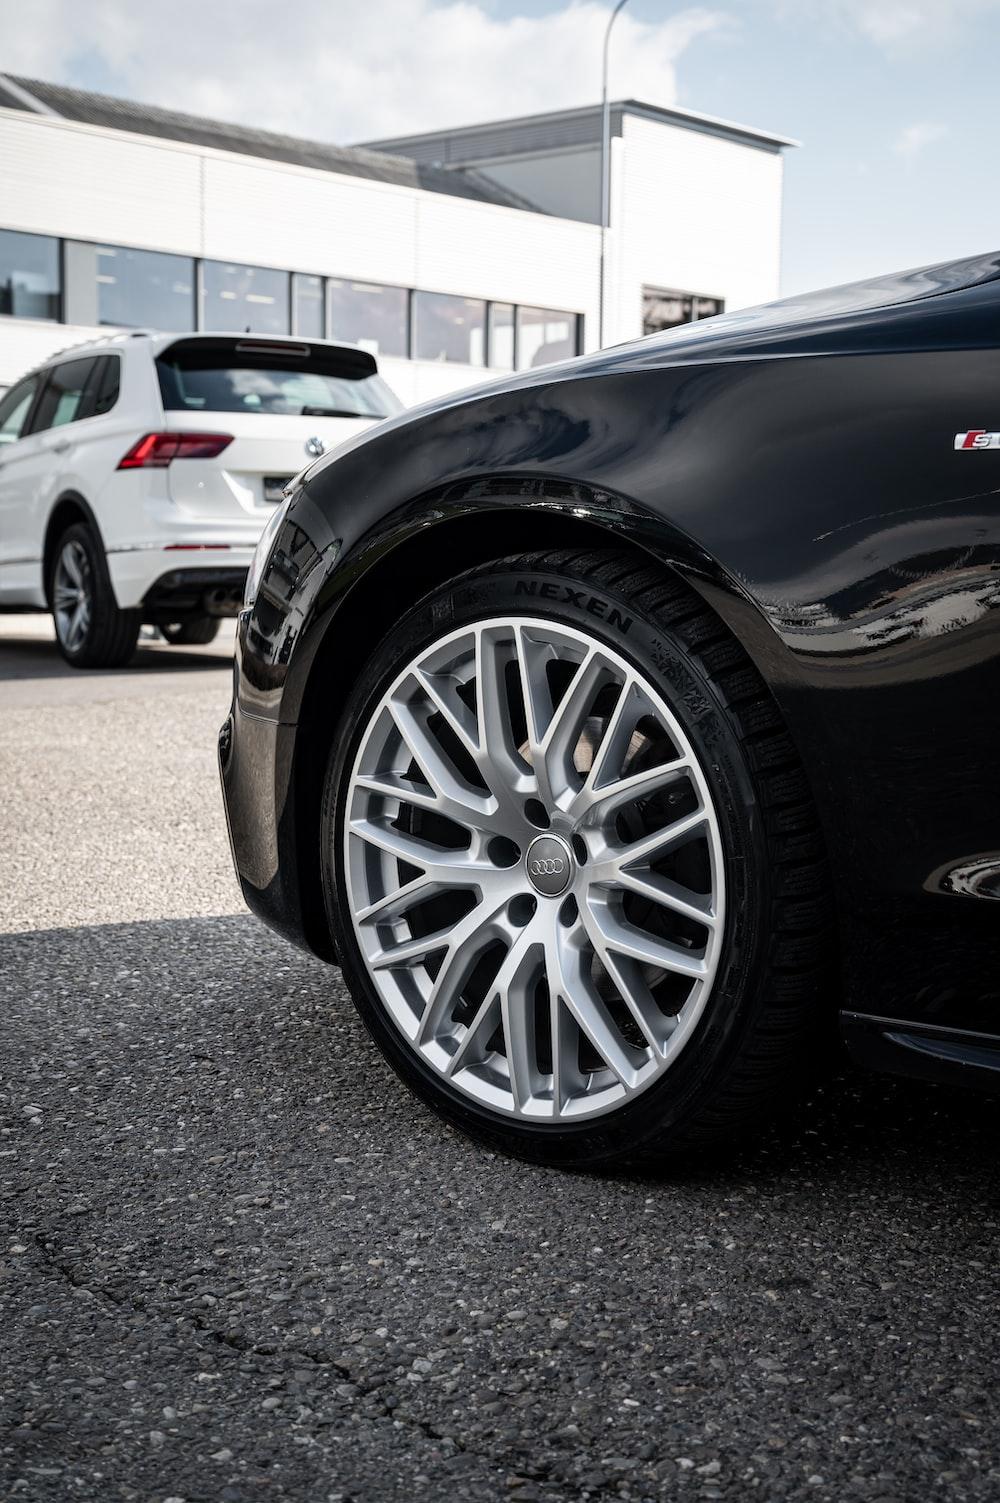 black car with silver wheel